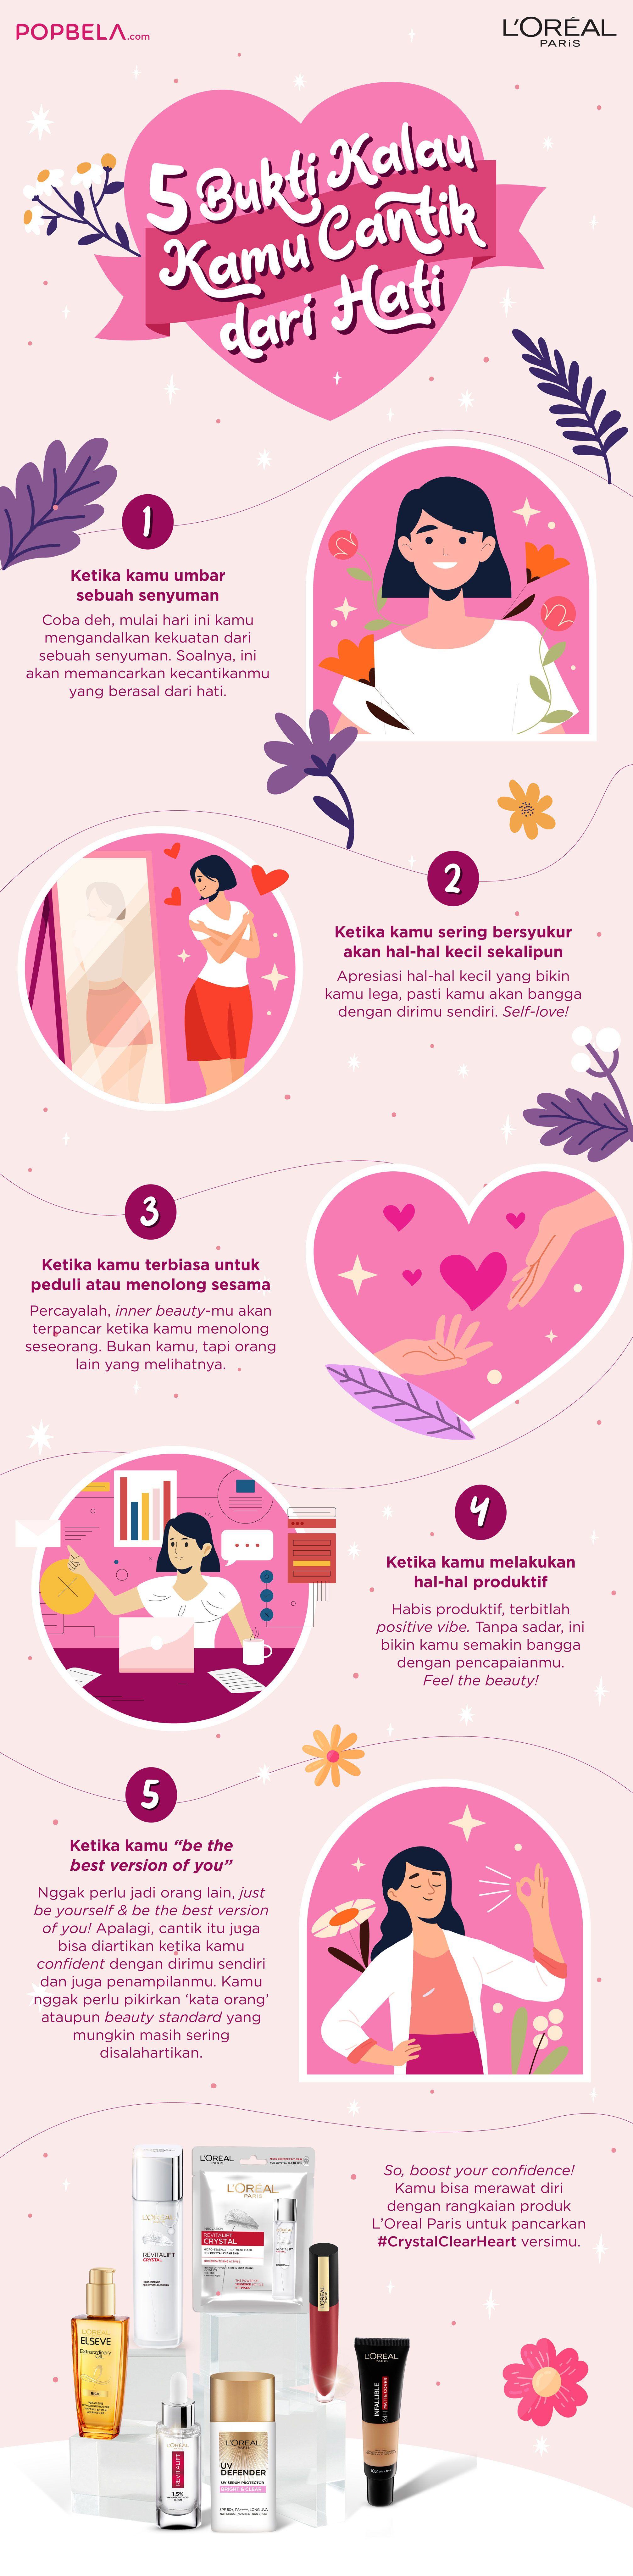 Baca 5 Hal Ini Perlahan, Kamu Bisa Paham Betapa Cantiknya Kamu!